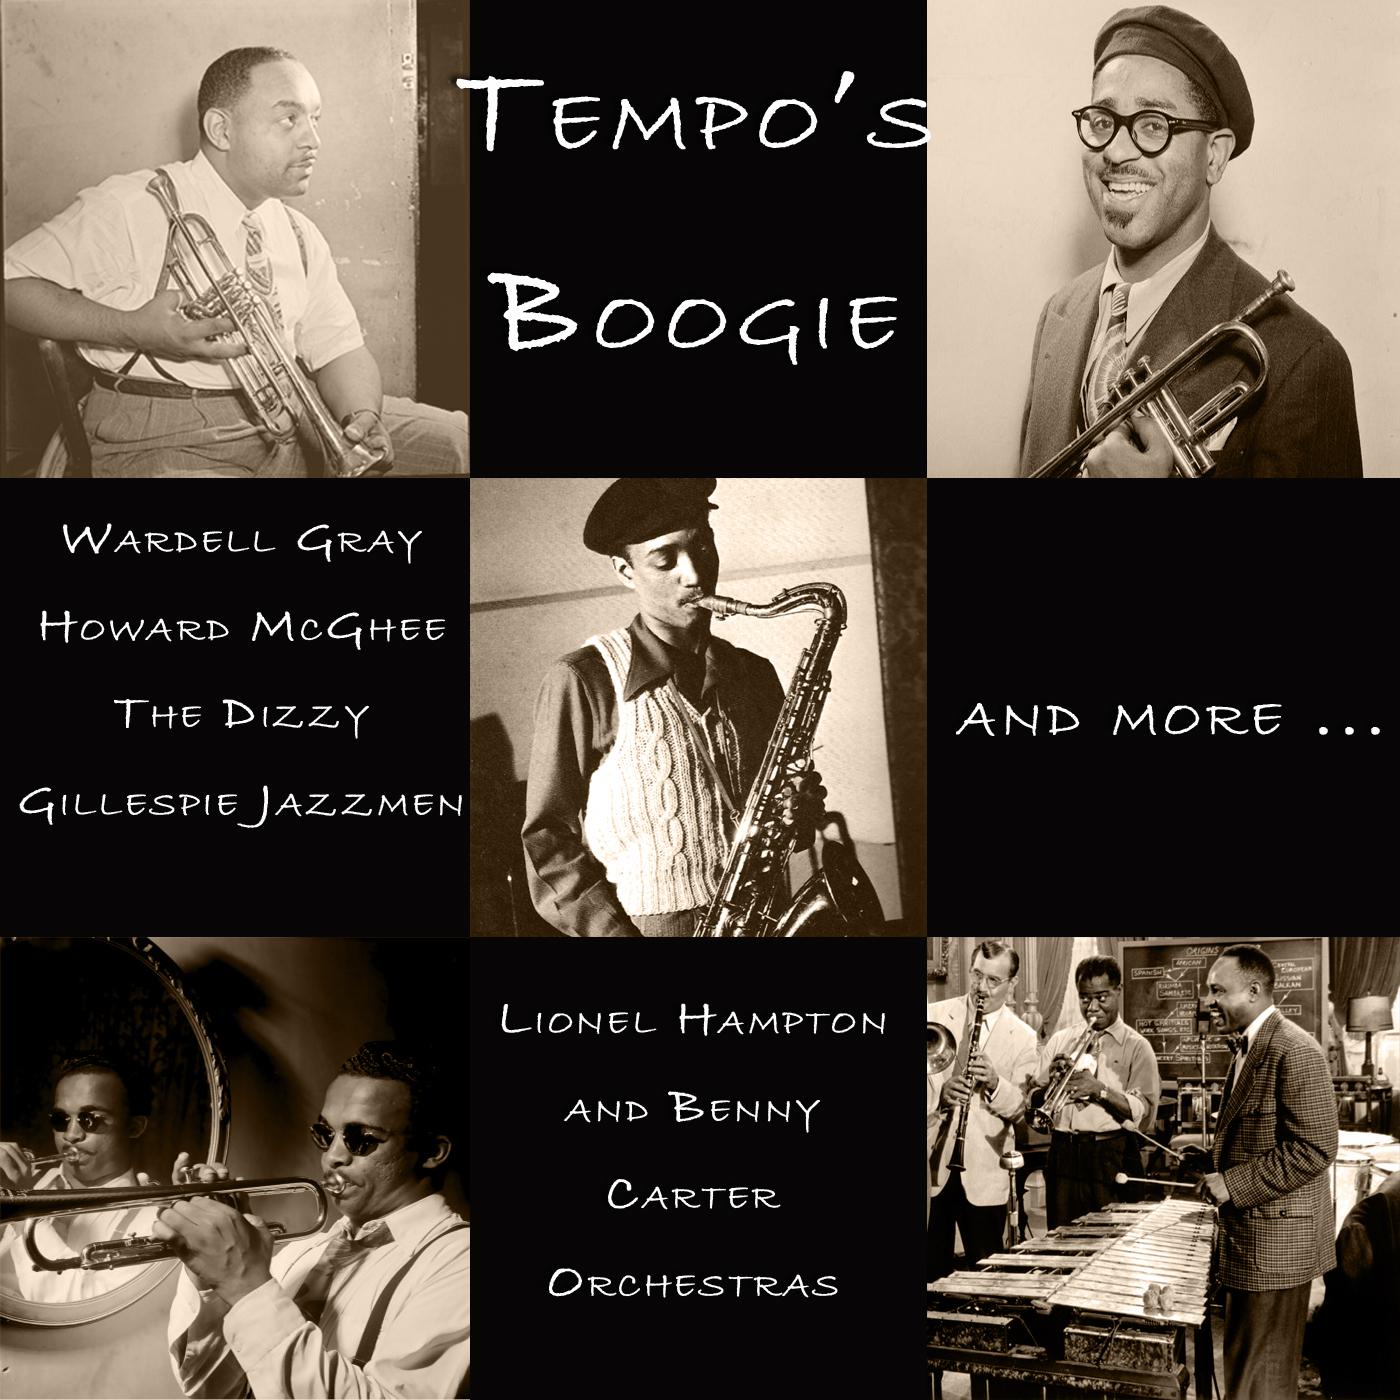 Tempo's Boogie